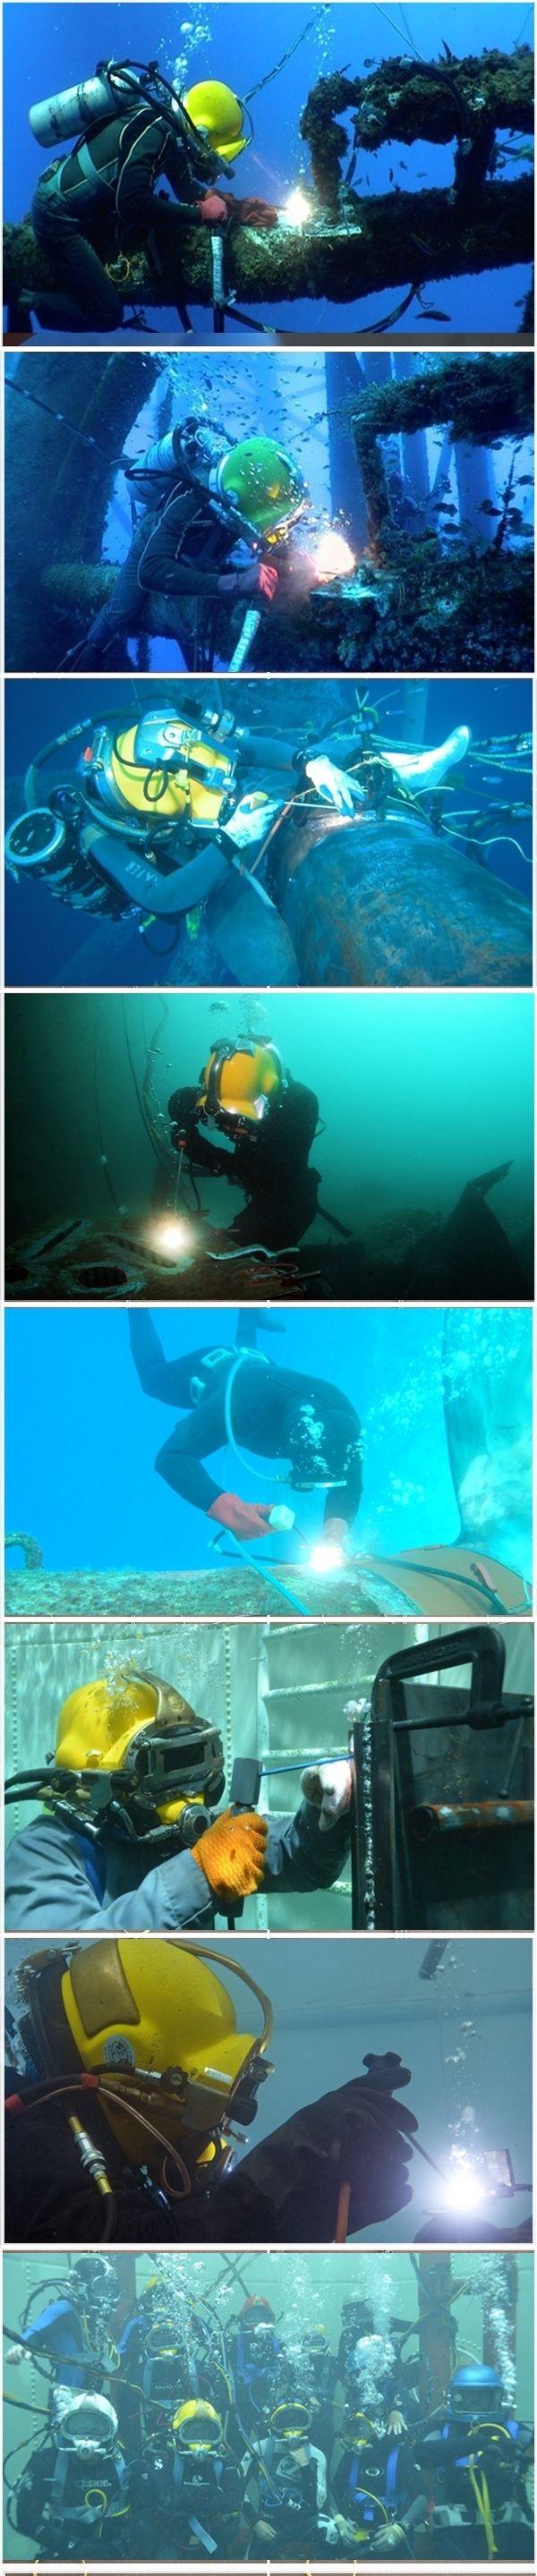 25 best ideas about underwater welding on pinterest - Dive shops near me ...